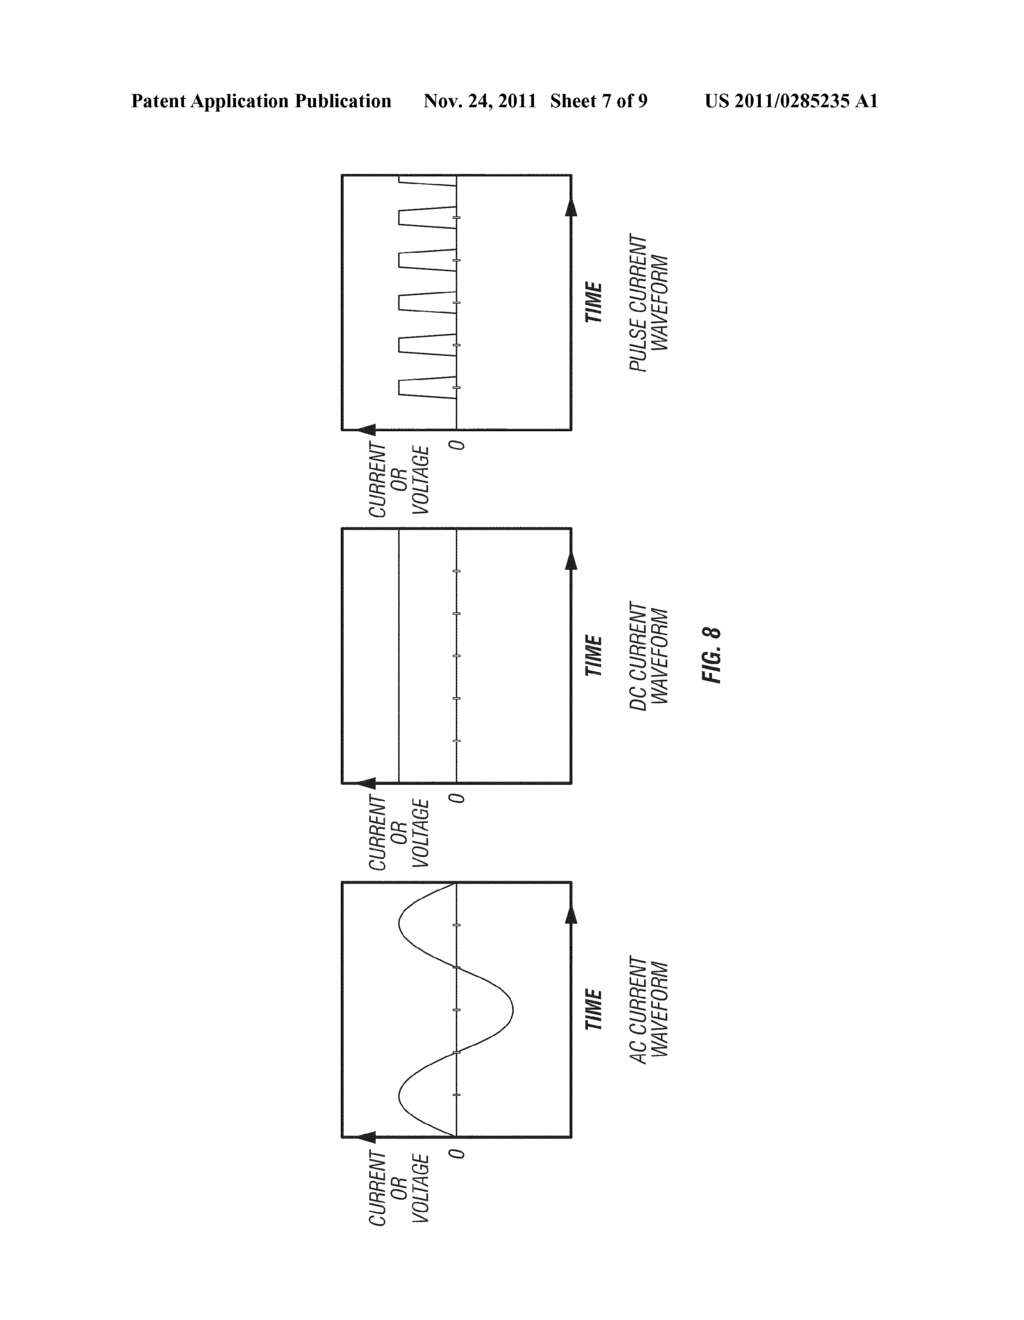 Gm Pulse Generator Schematic Diagram